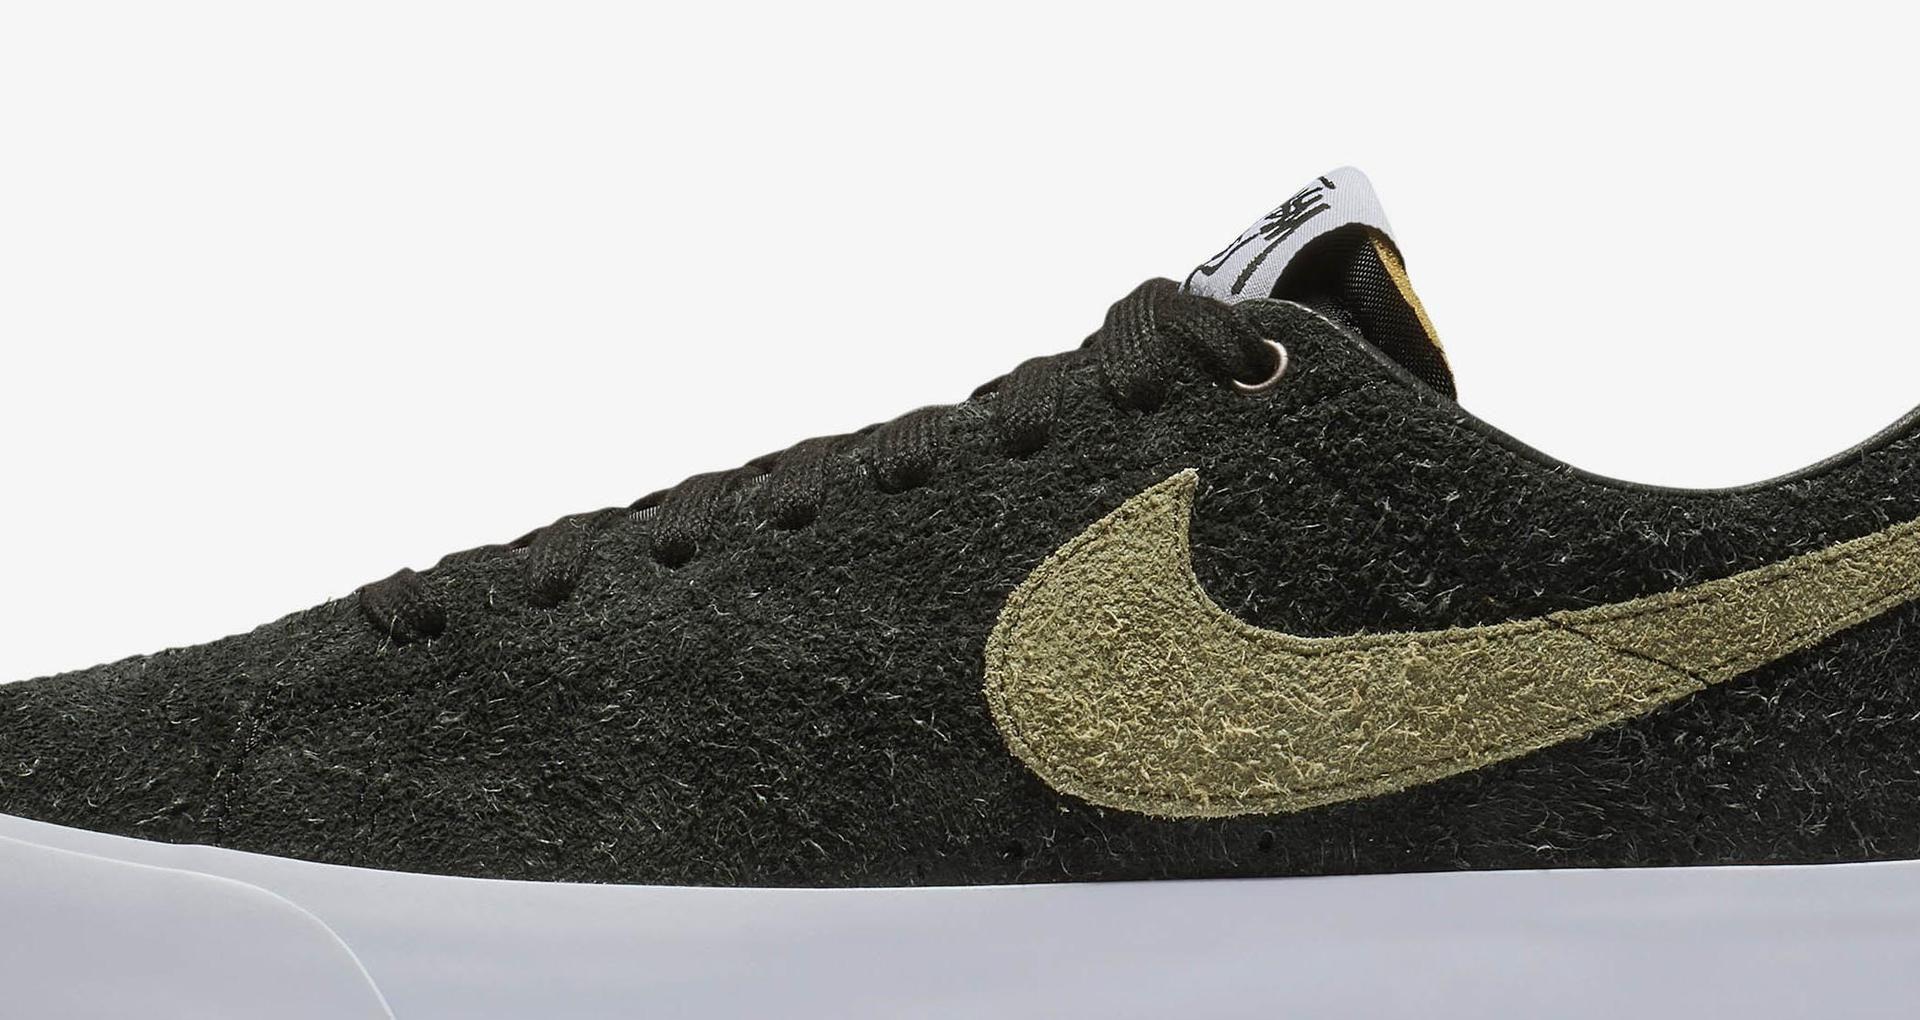 promo code d1612 d80e9 Nike SB Zoom Blazer Low Stussy x Terps 'Black & Reflect ...